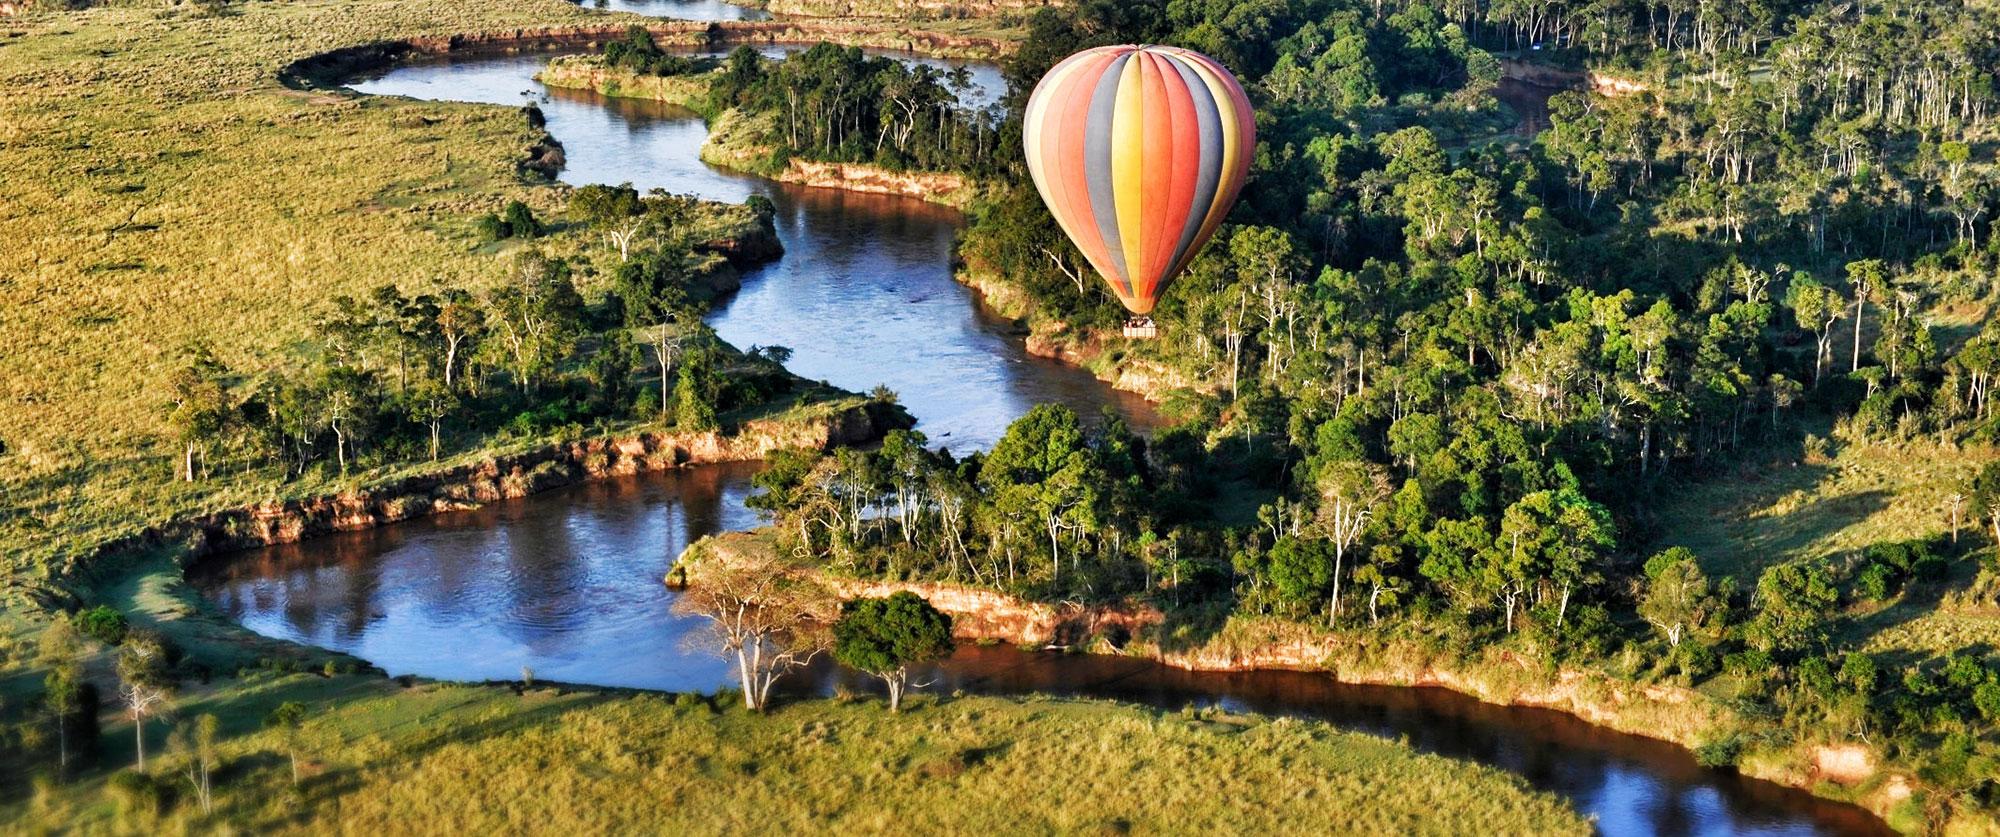 Luxury Kenya Safari - Great Migration - Maasai Mara Wildlife Safaris - Serian The Original